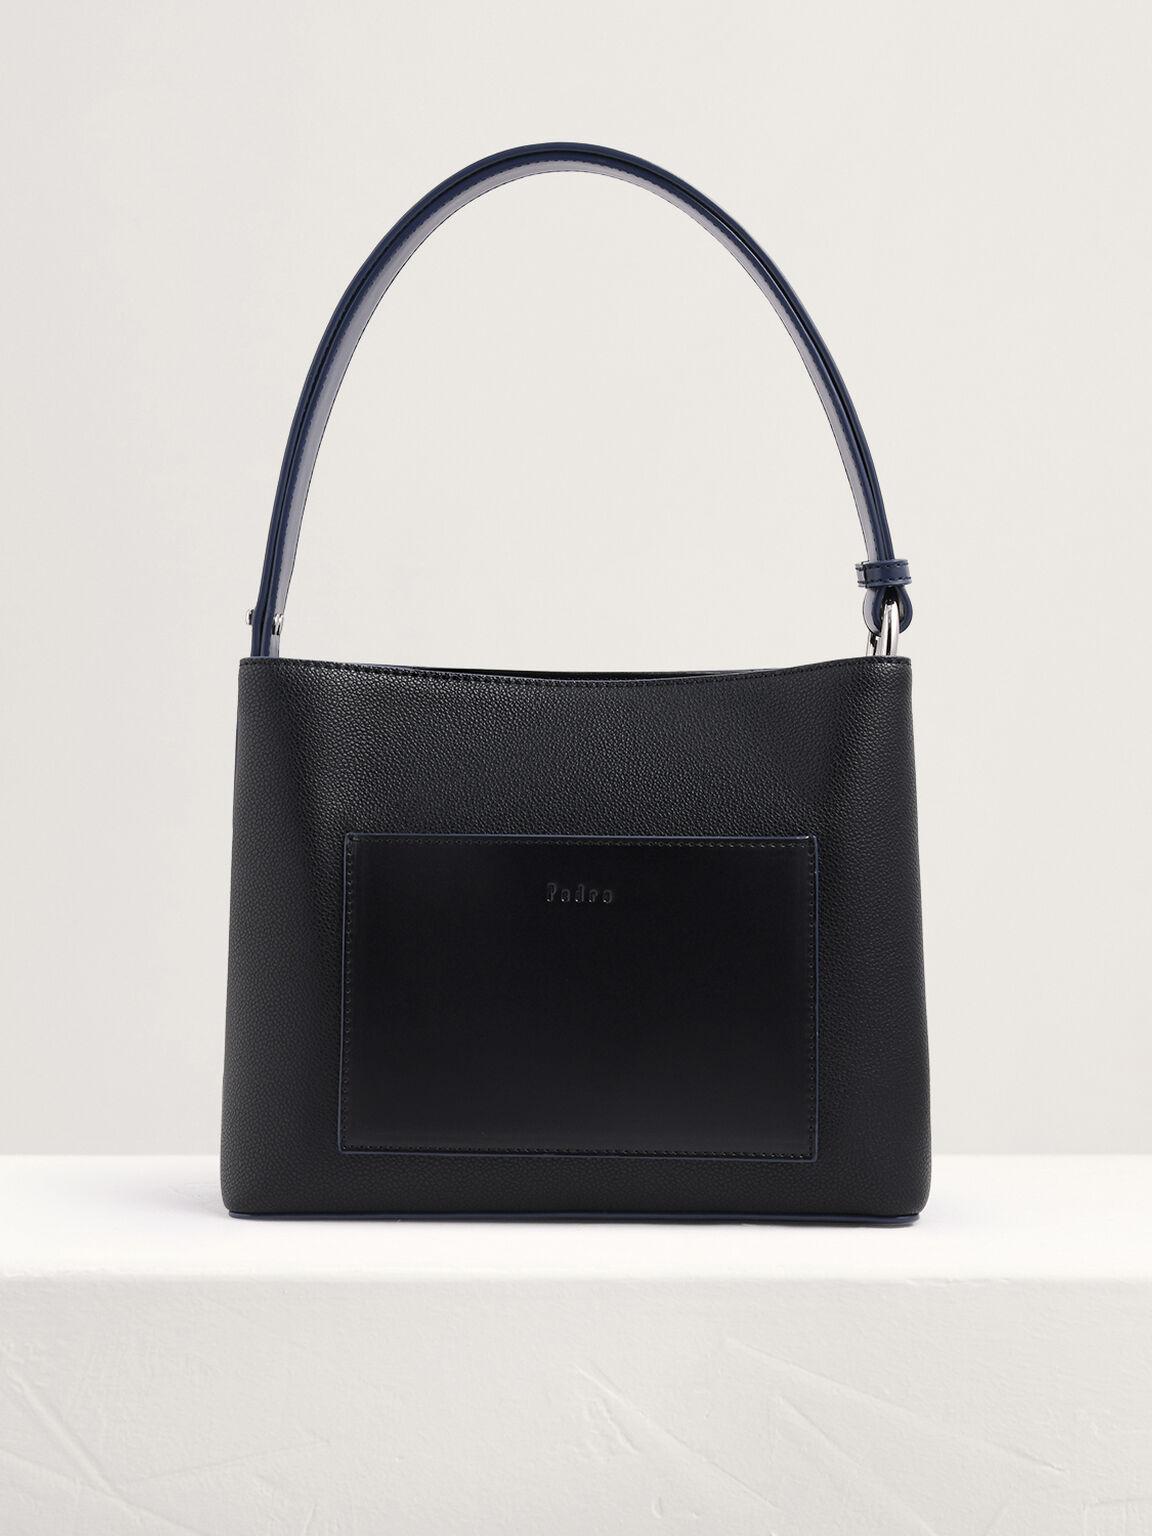 Duo-Carry Top Handle Bag, Black, hi-res